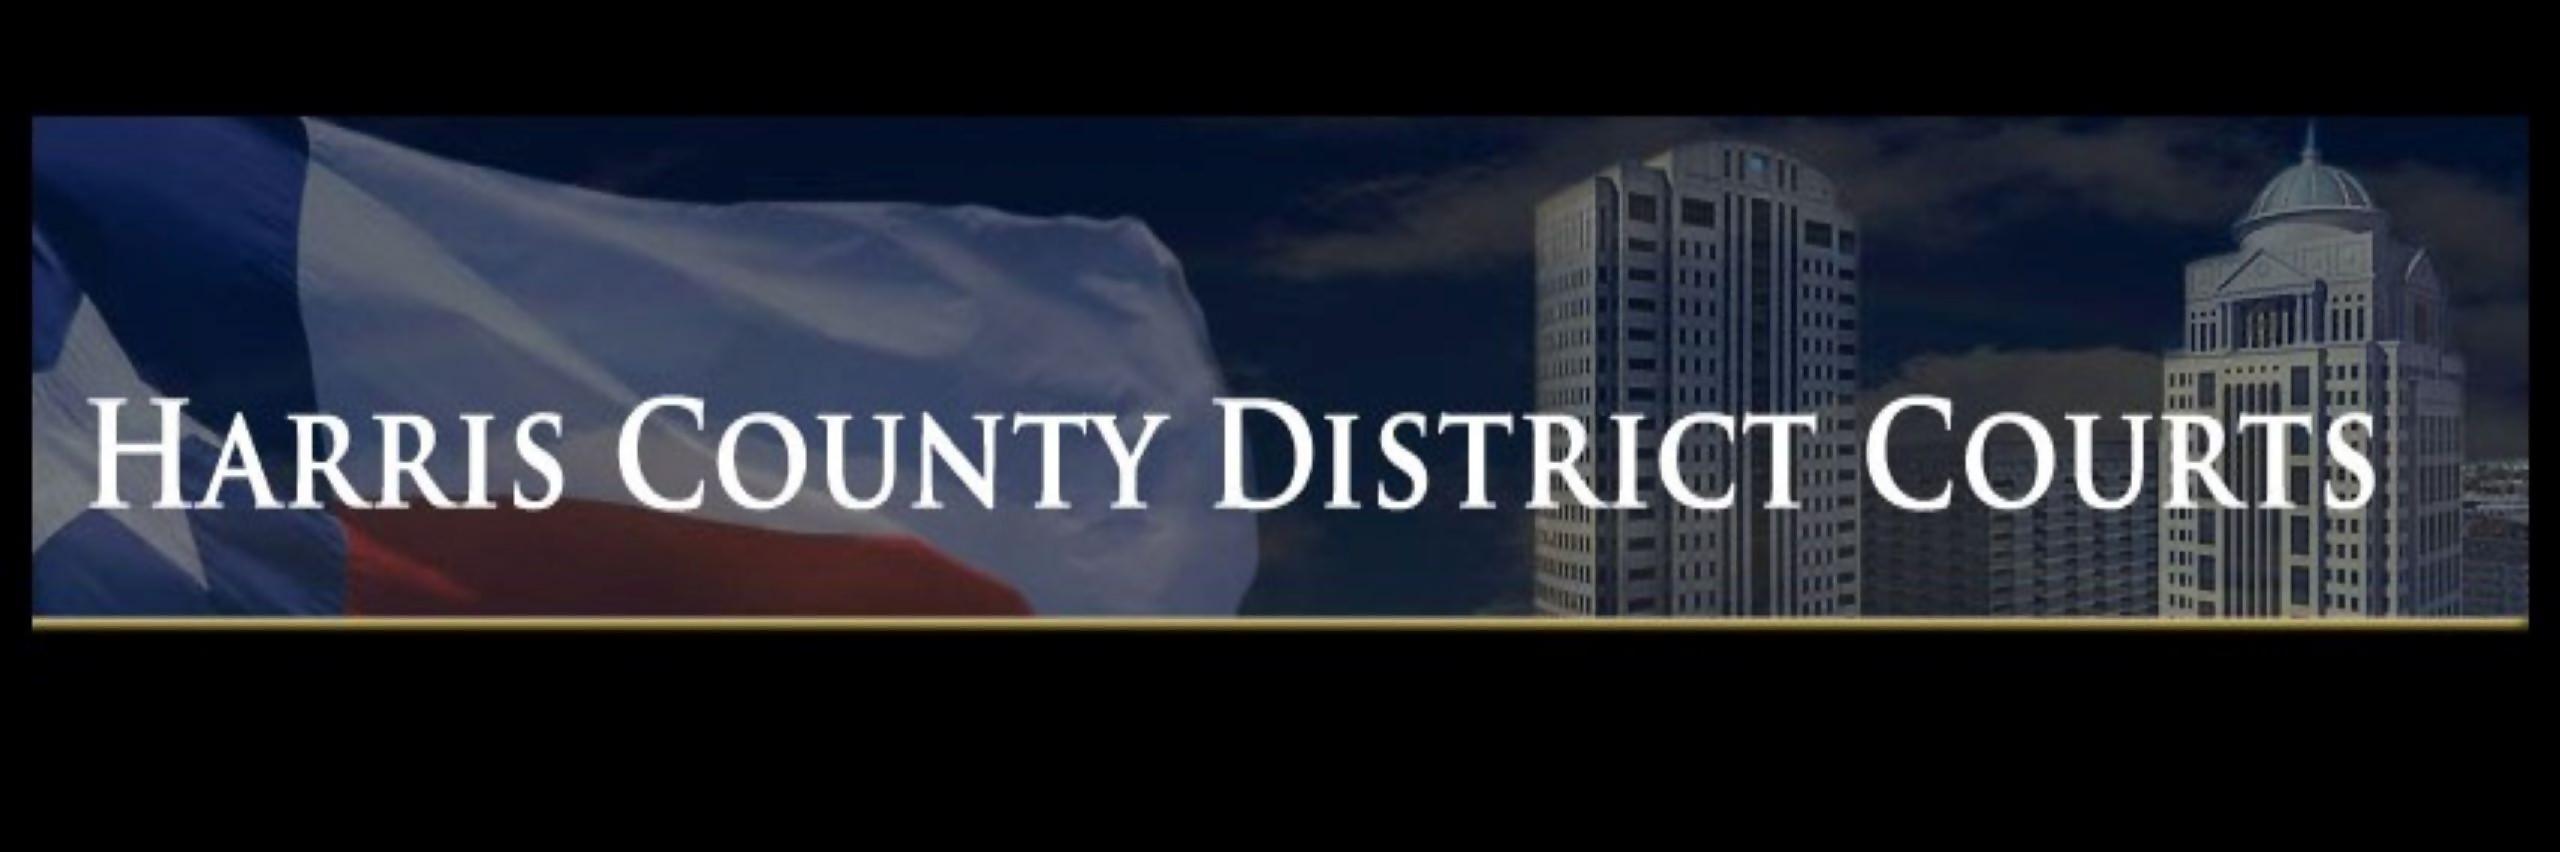 333rd District Court - Live Stream